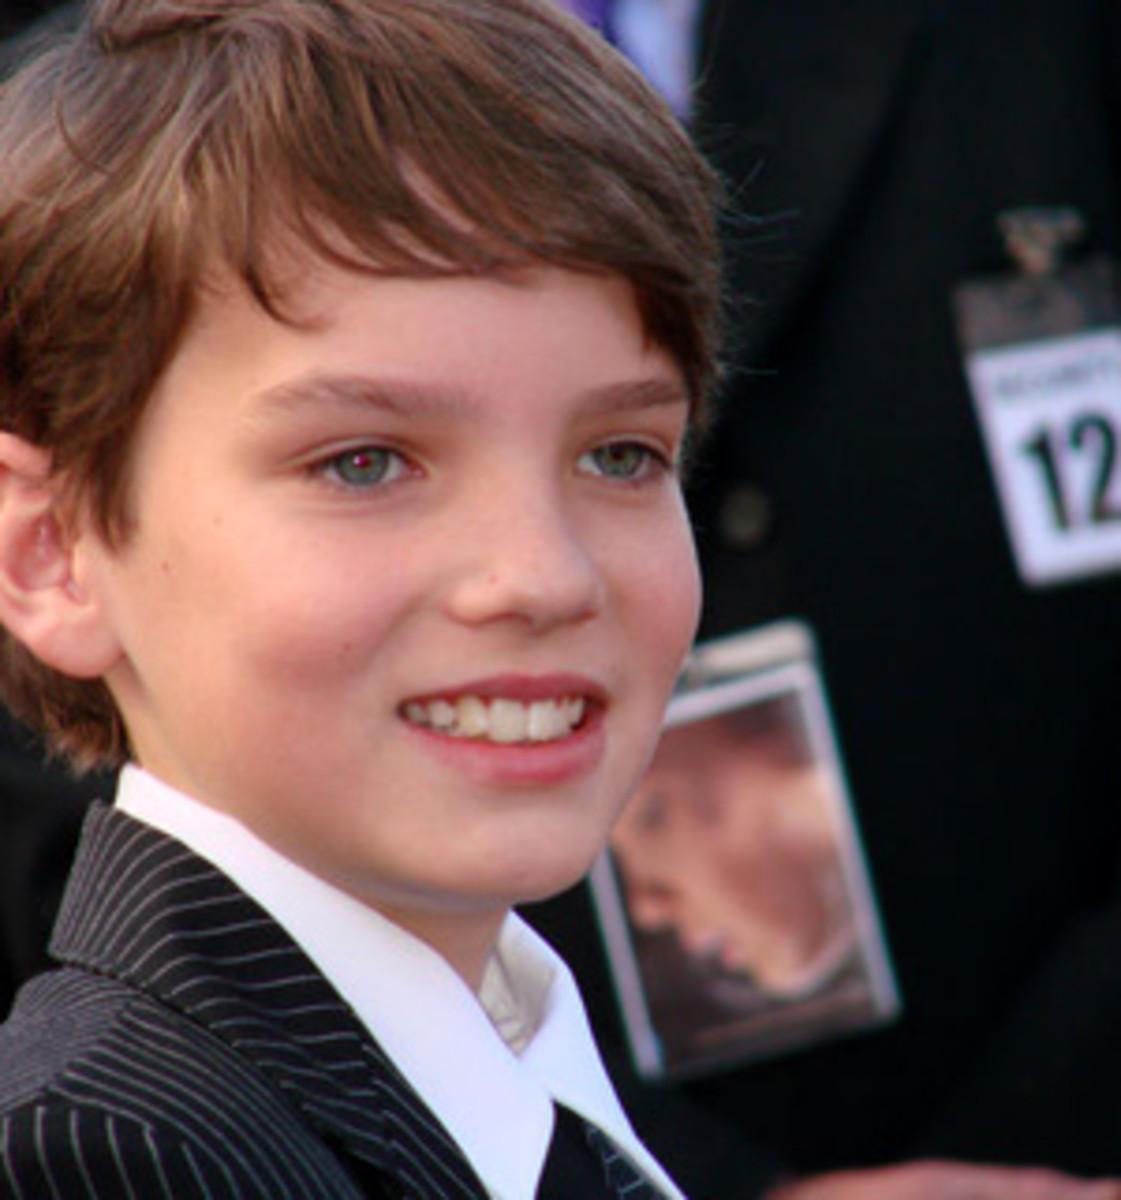 Actor Kodi Smit-McPhee